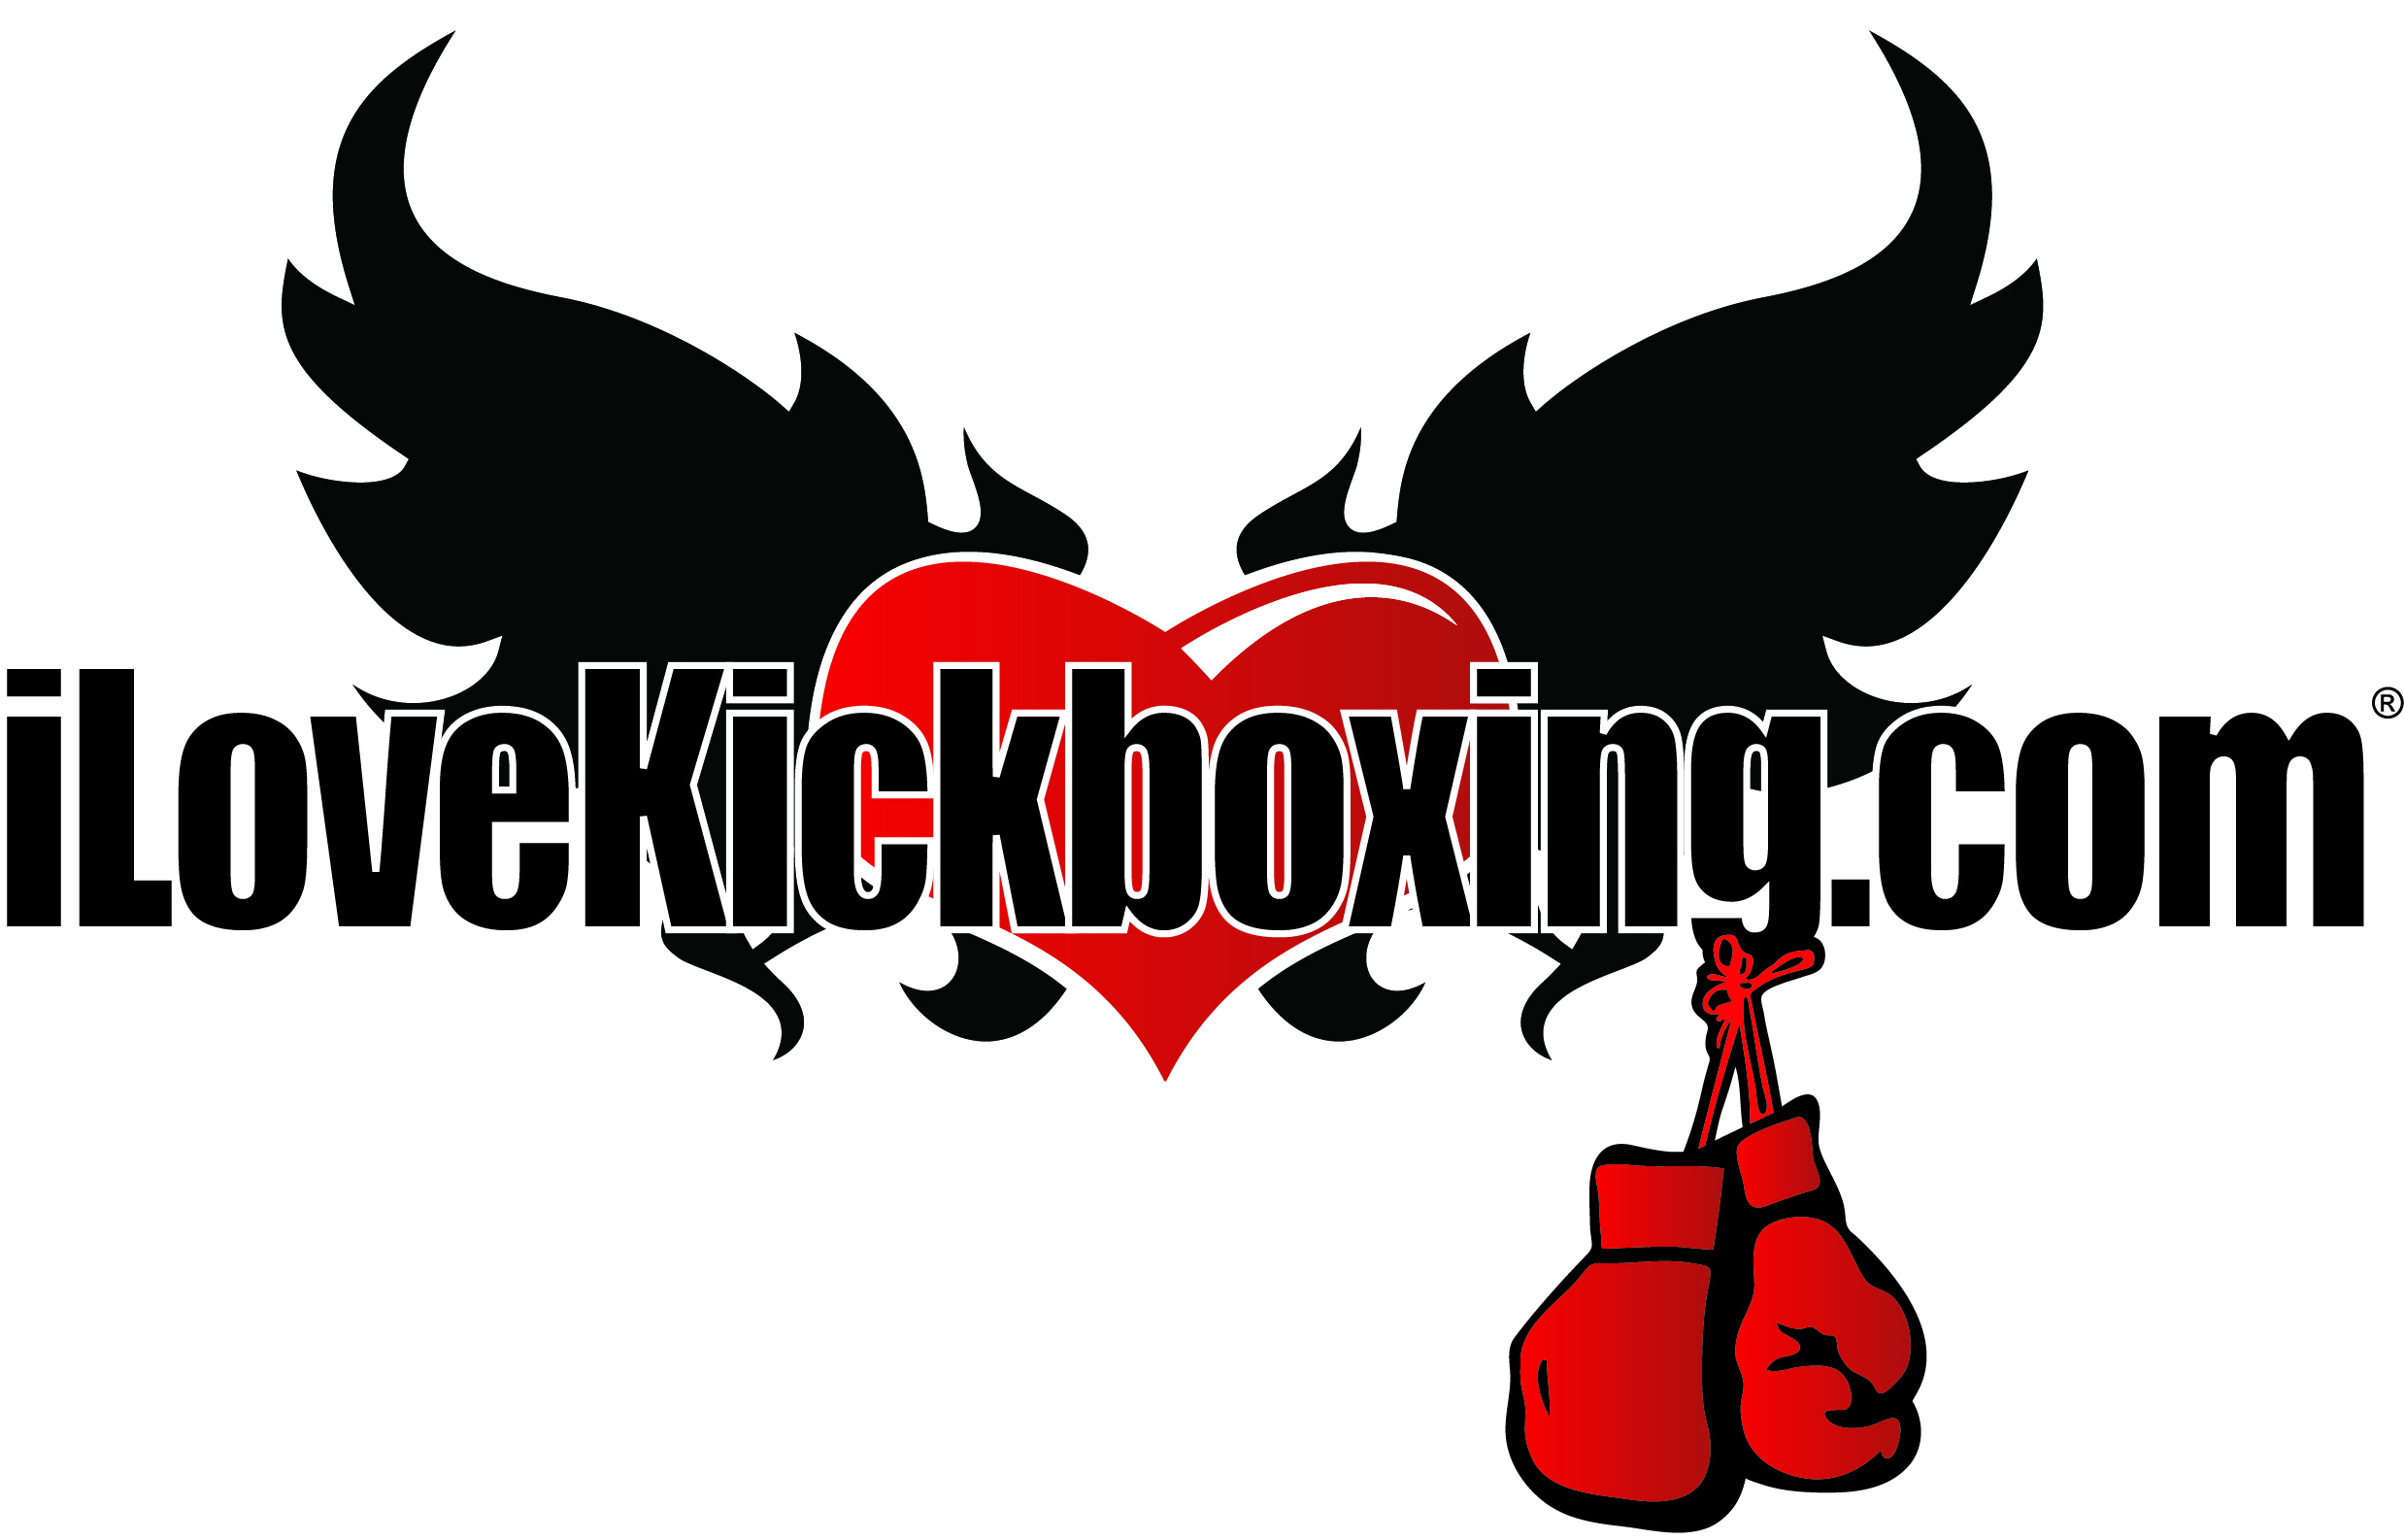 I Love Kickboxing - Sandy - ad image